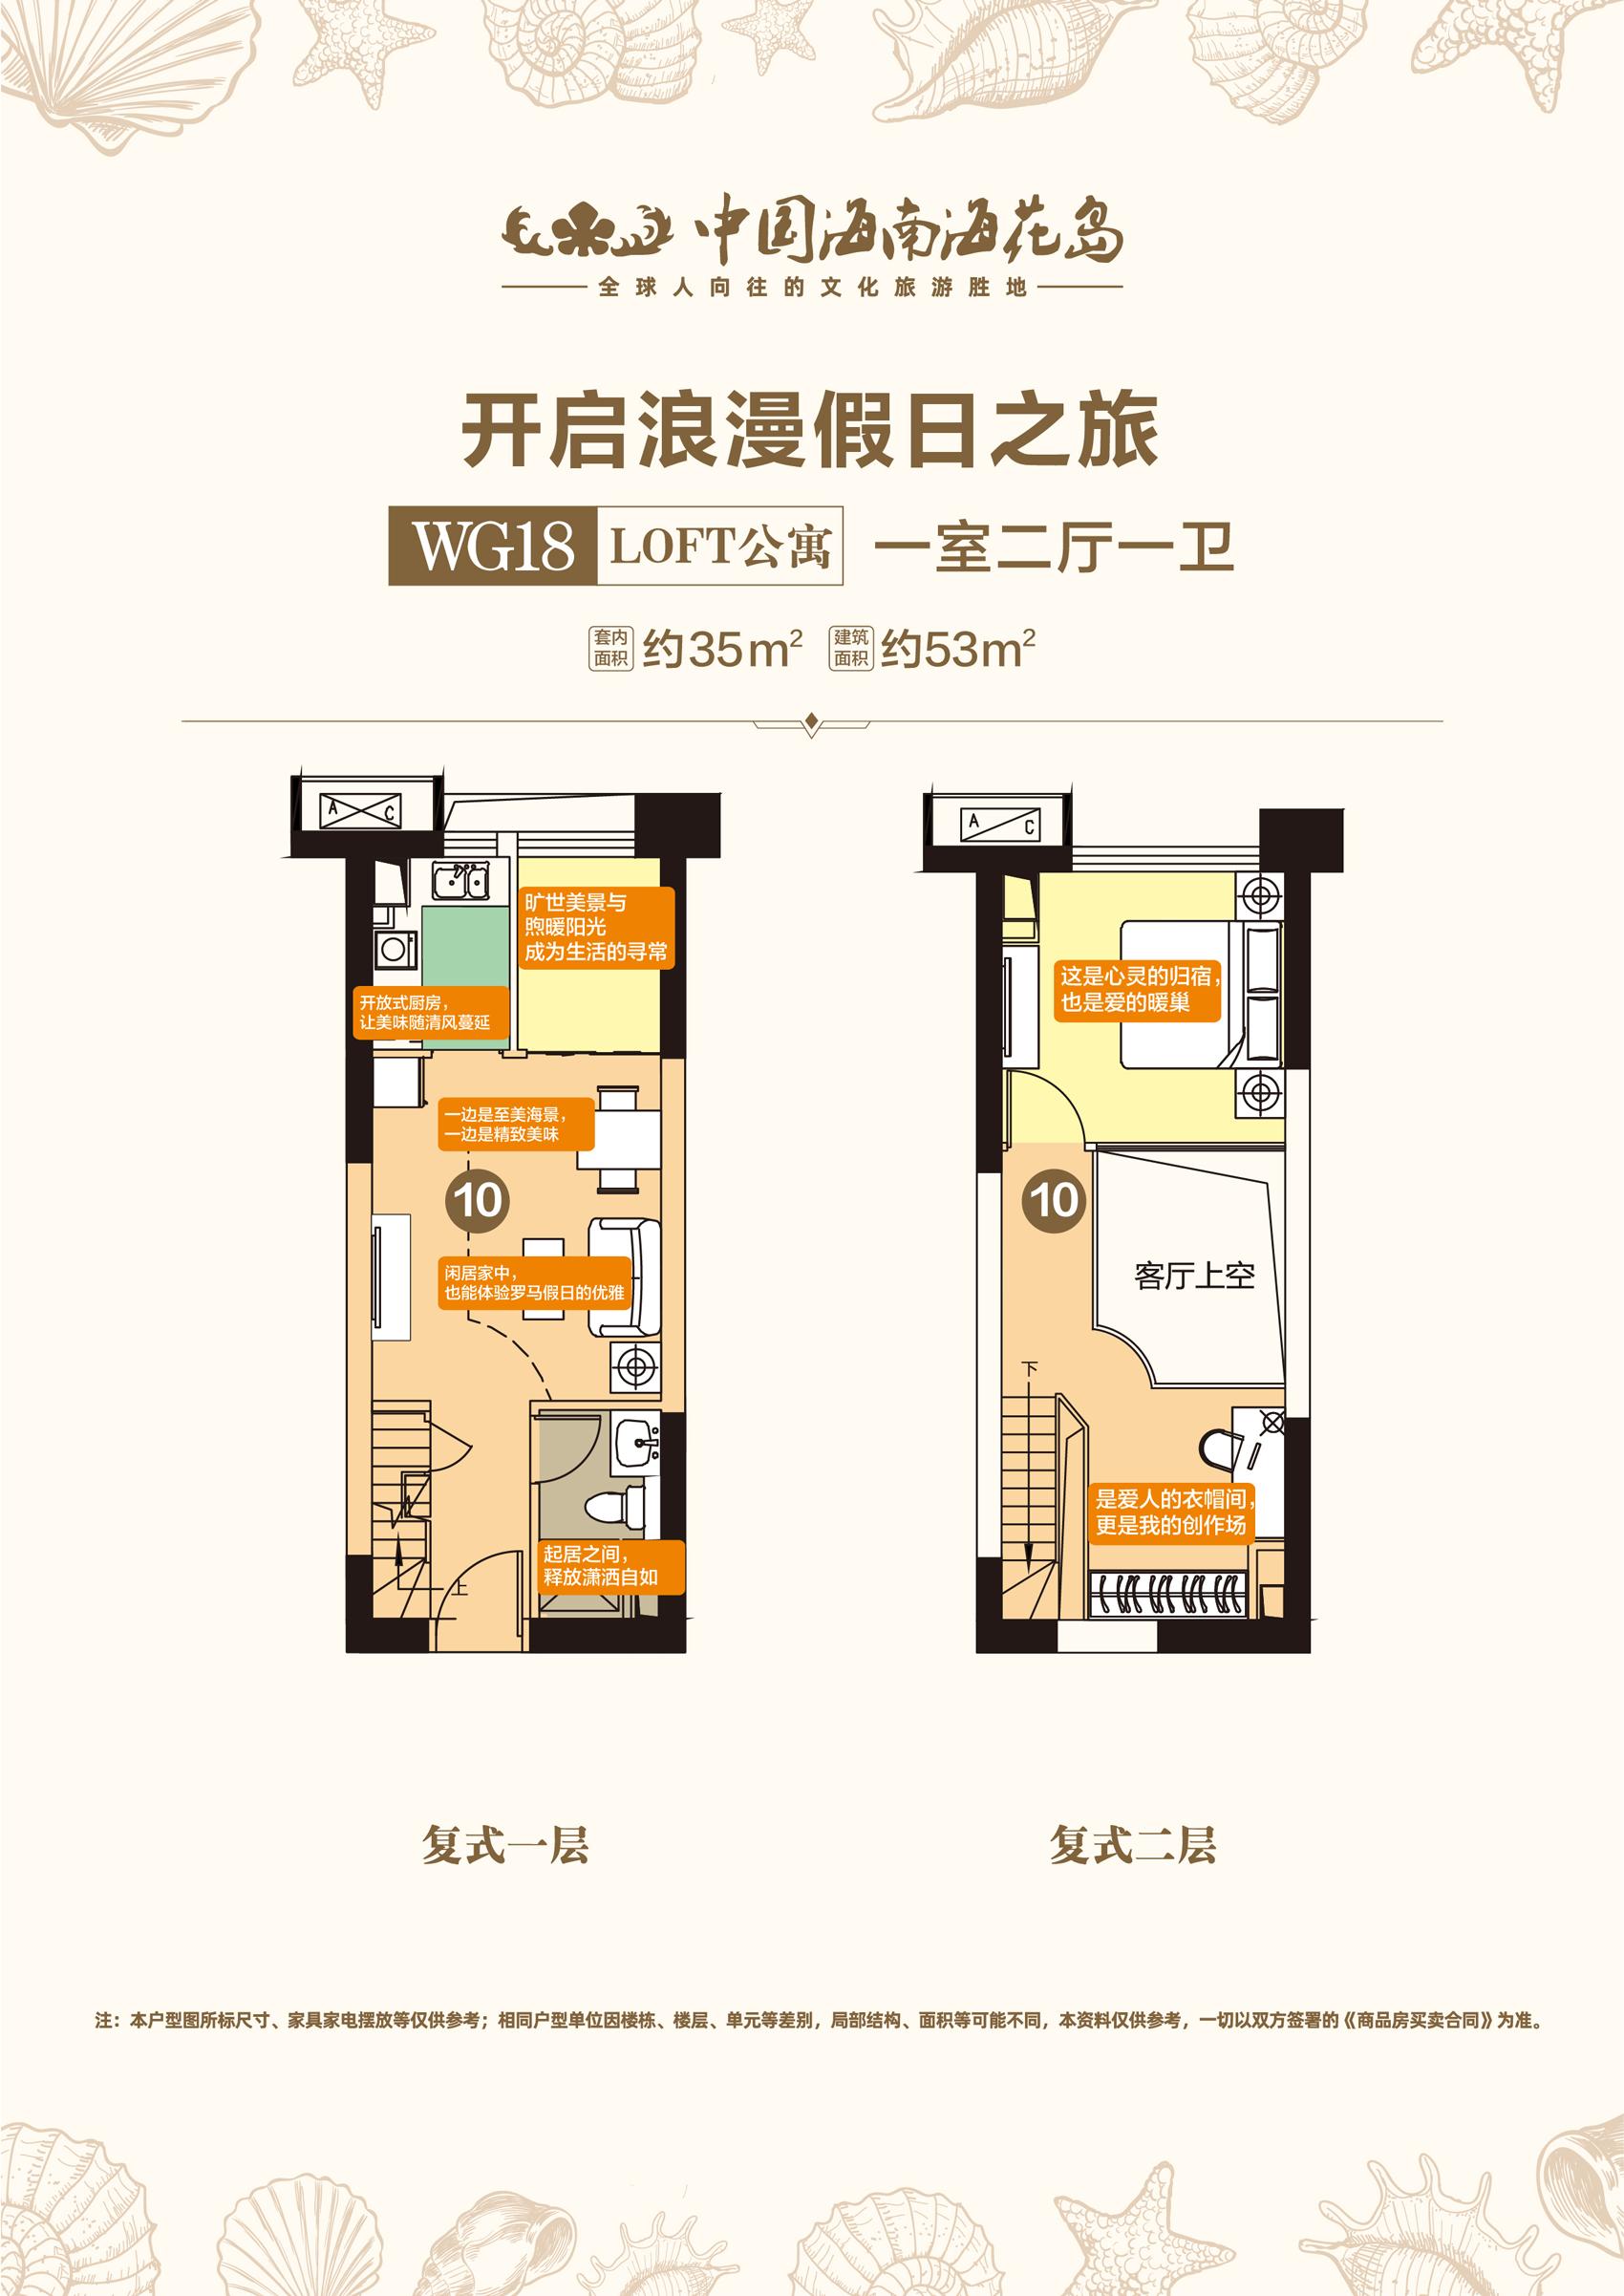 WG18LOFT公寓 1室2厅1卫 建面约35㎡、53㎡